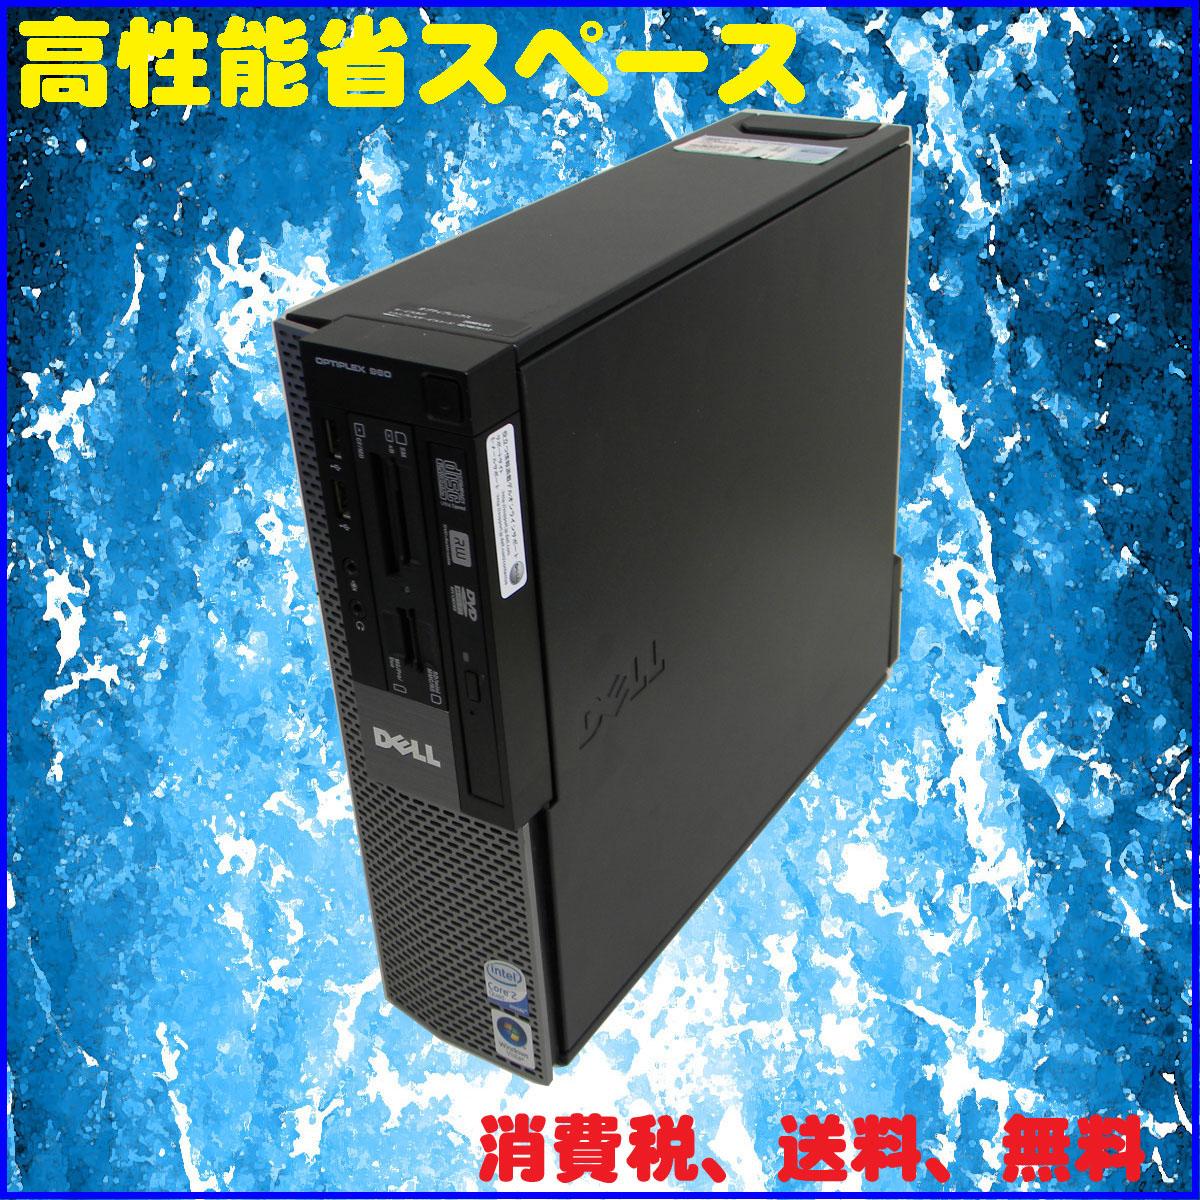 【MEM:4GB&HDD250GB搭載!】中古パソコン Windows7 DELL Optiplex 960 【中古】 DVDスーパーマルチ Windows7 セットアップ済み KingSoft社 Officeインストール済み◎